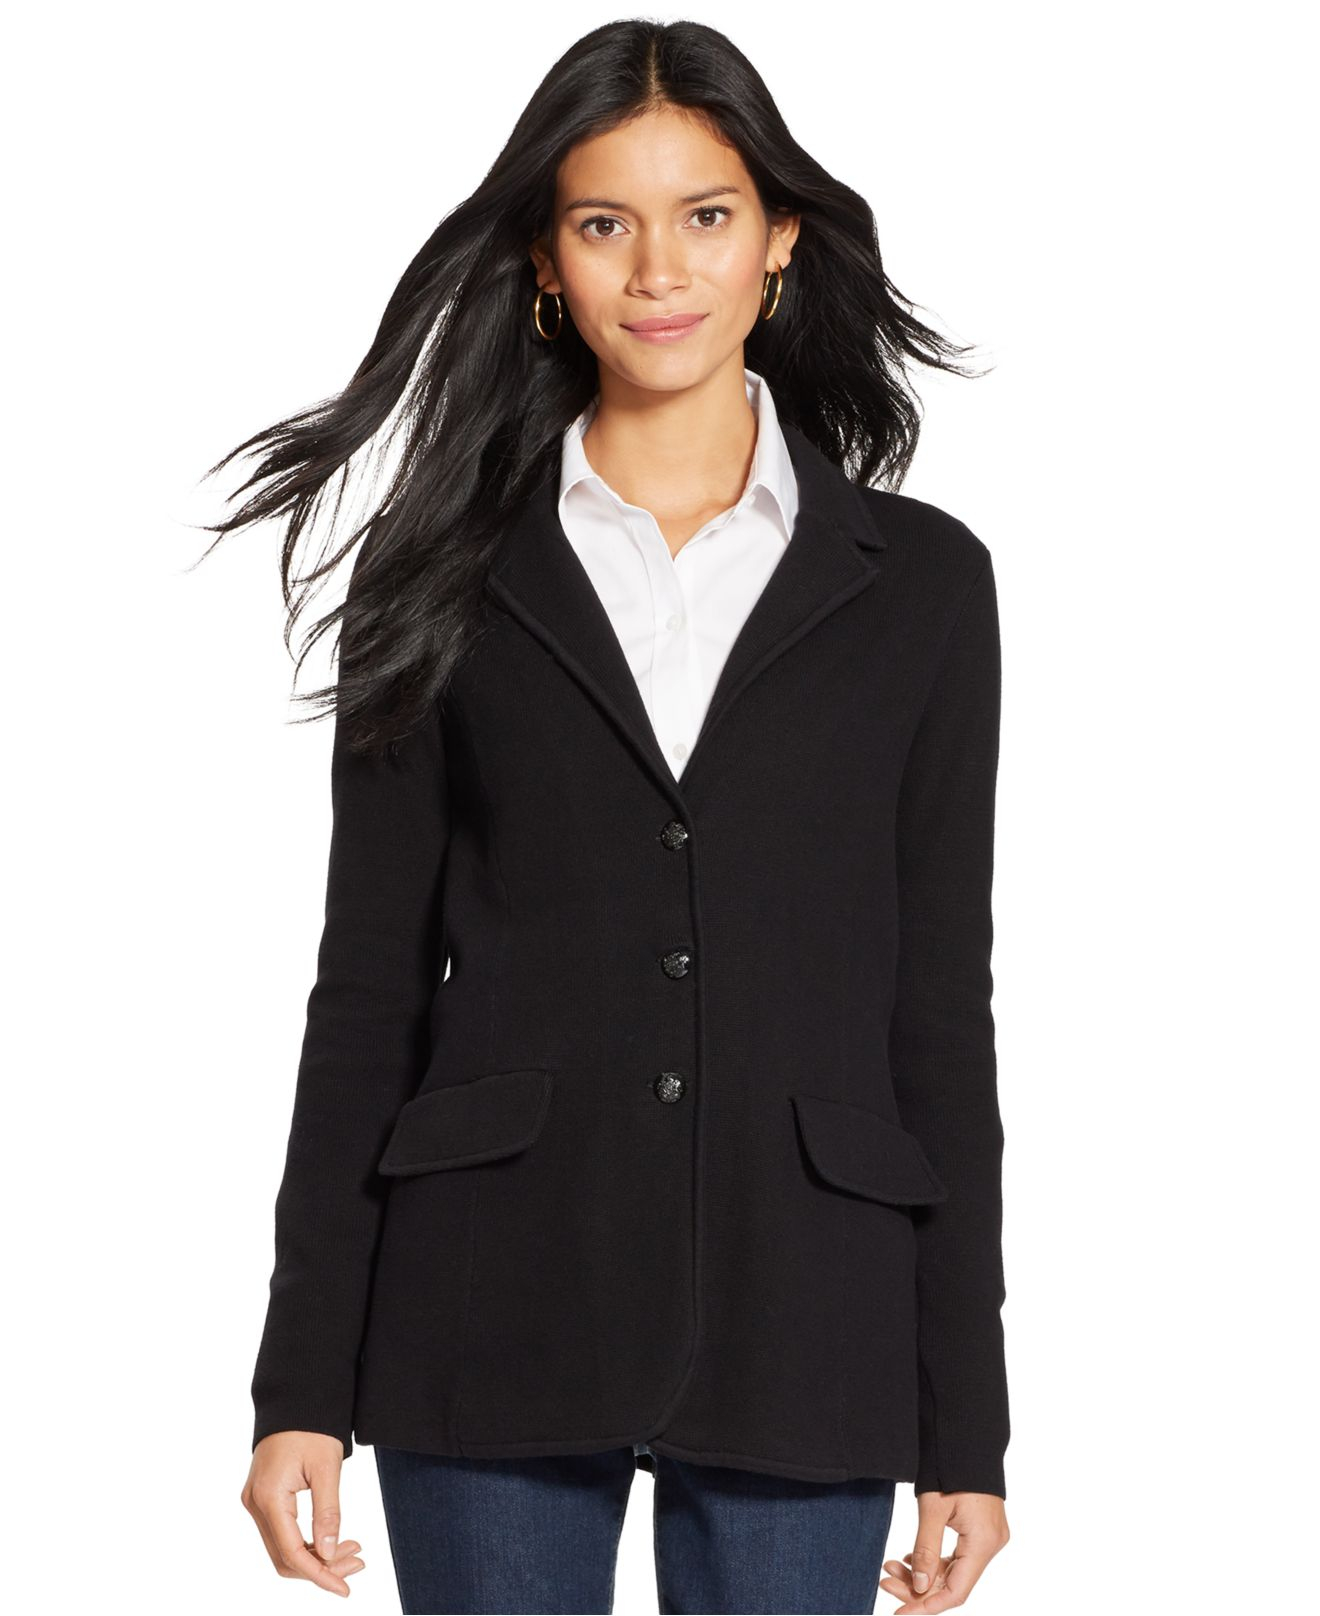 lauren by ralph lauren sweater blazer in black lyst. Black Bedroom Furniture Sets. Home Design Ideas